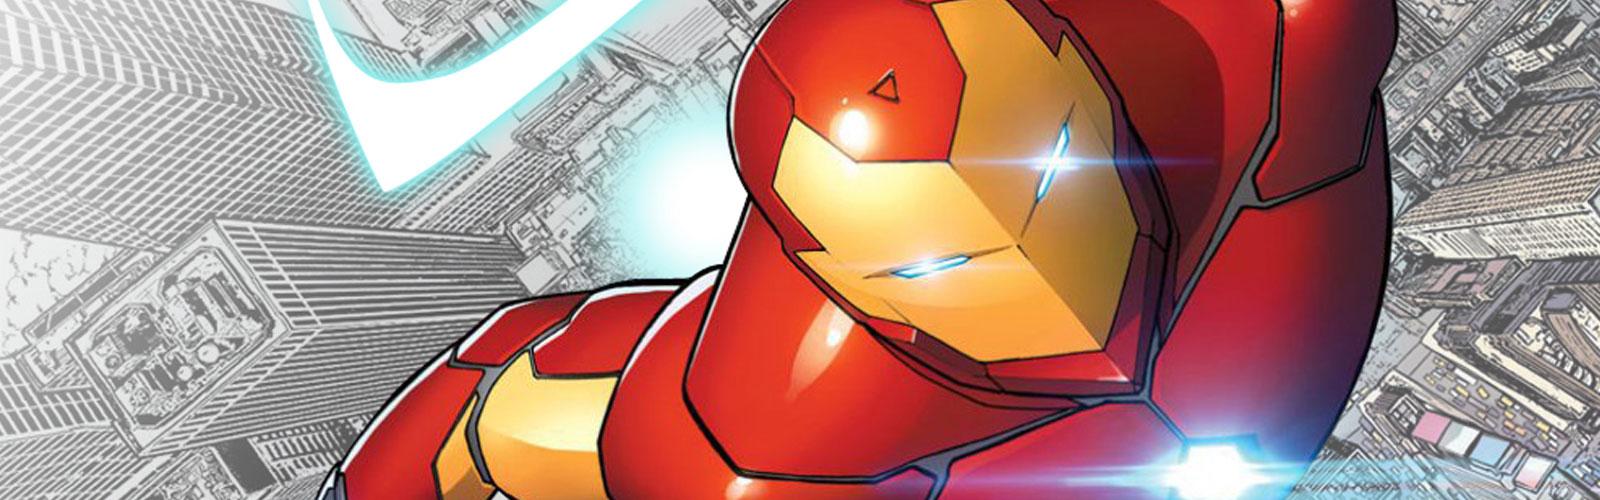 Illuminations 2015 07 - Invincible Iron Man